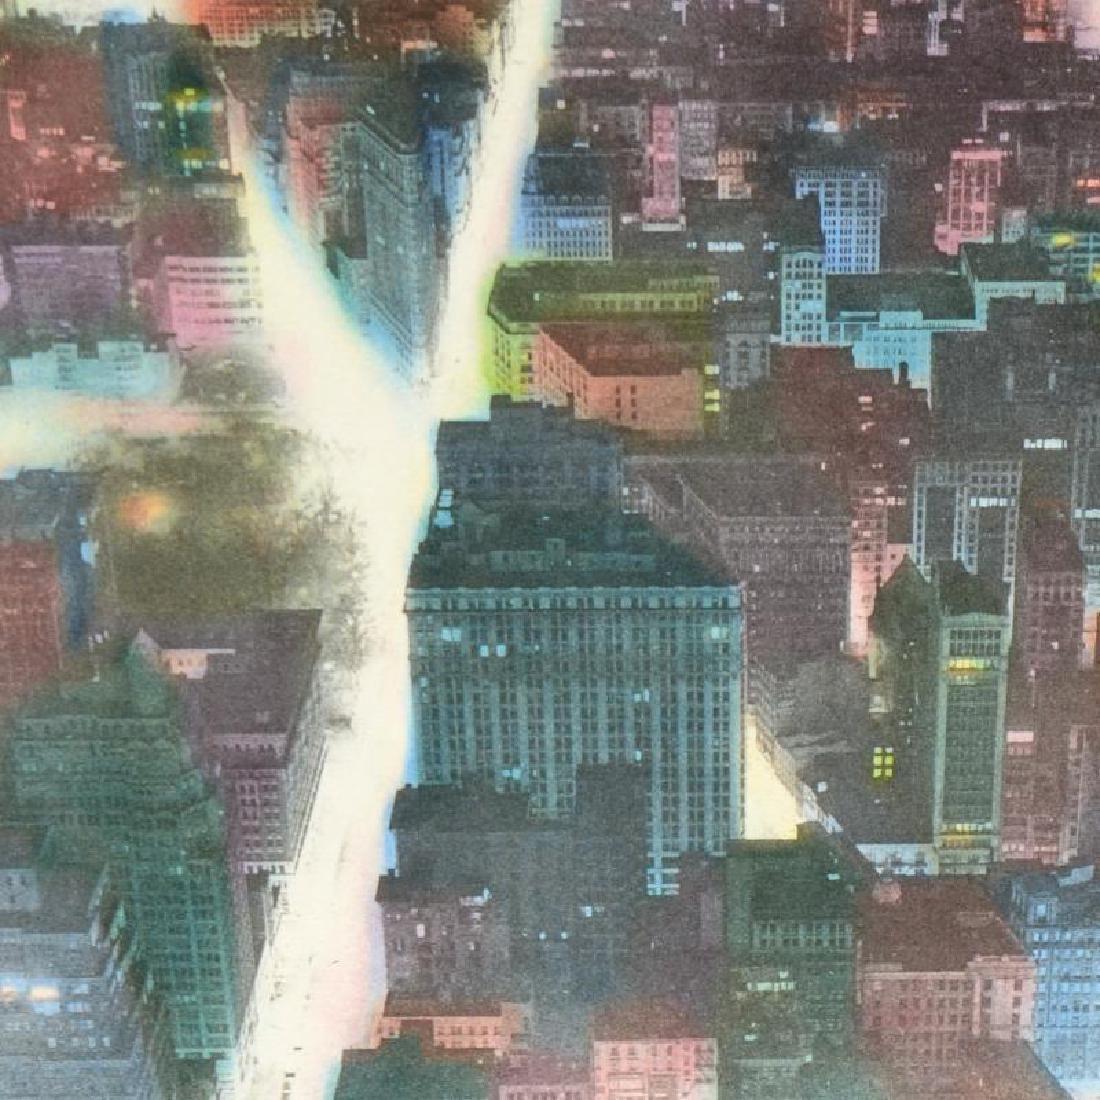 Rivers of Light by Lennard, Elizabeth - 2